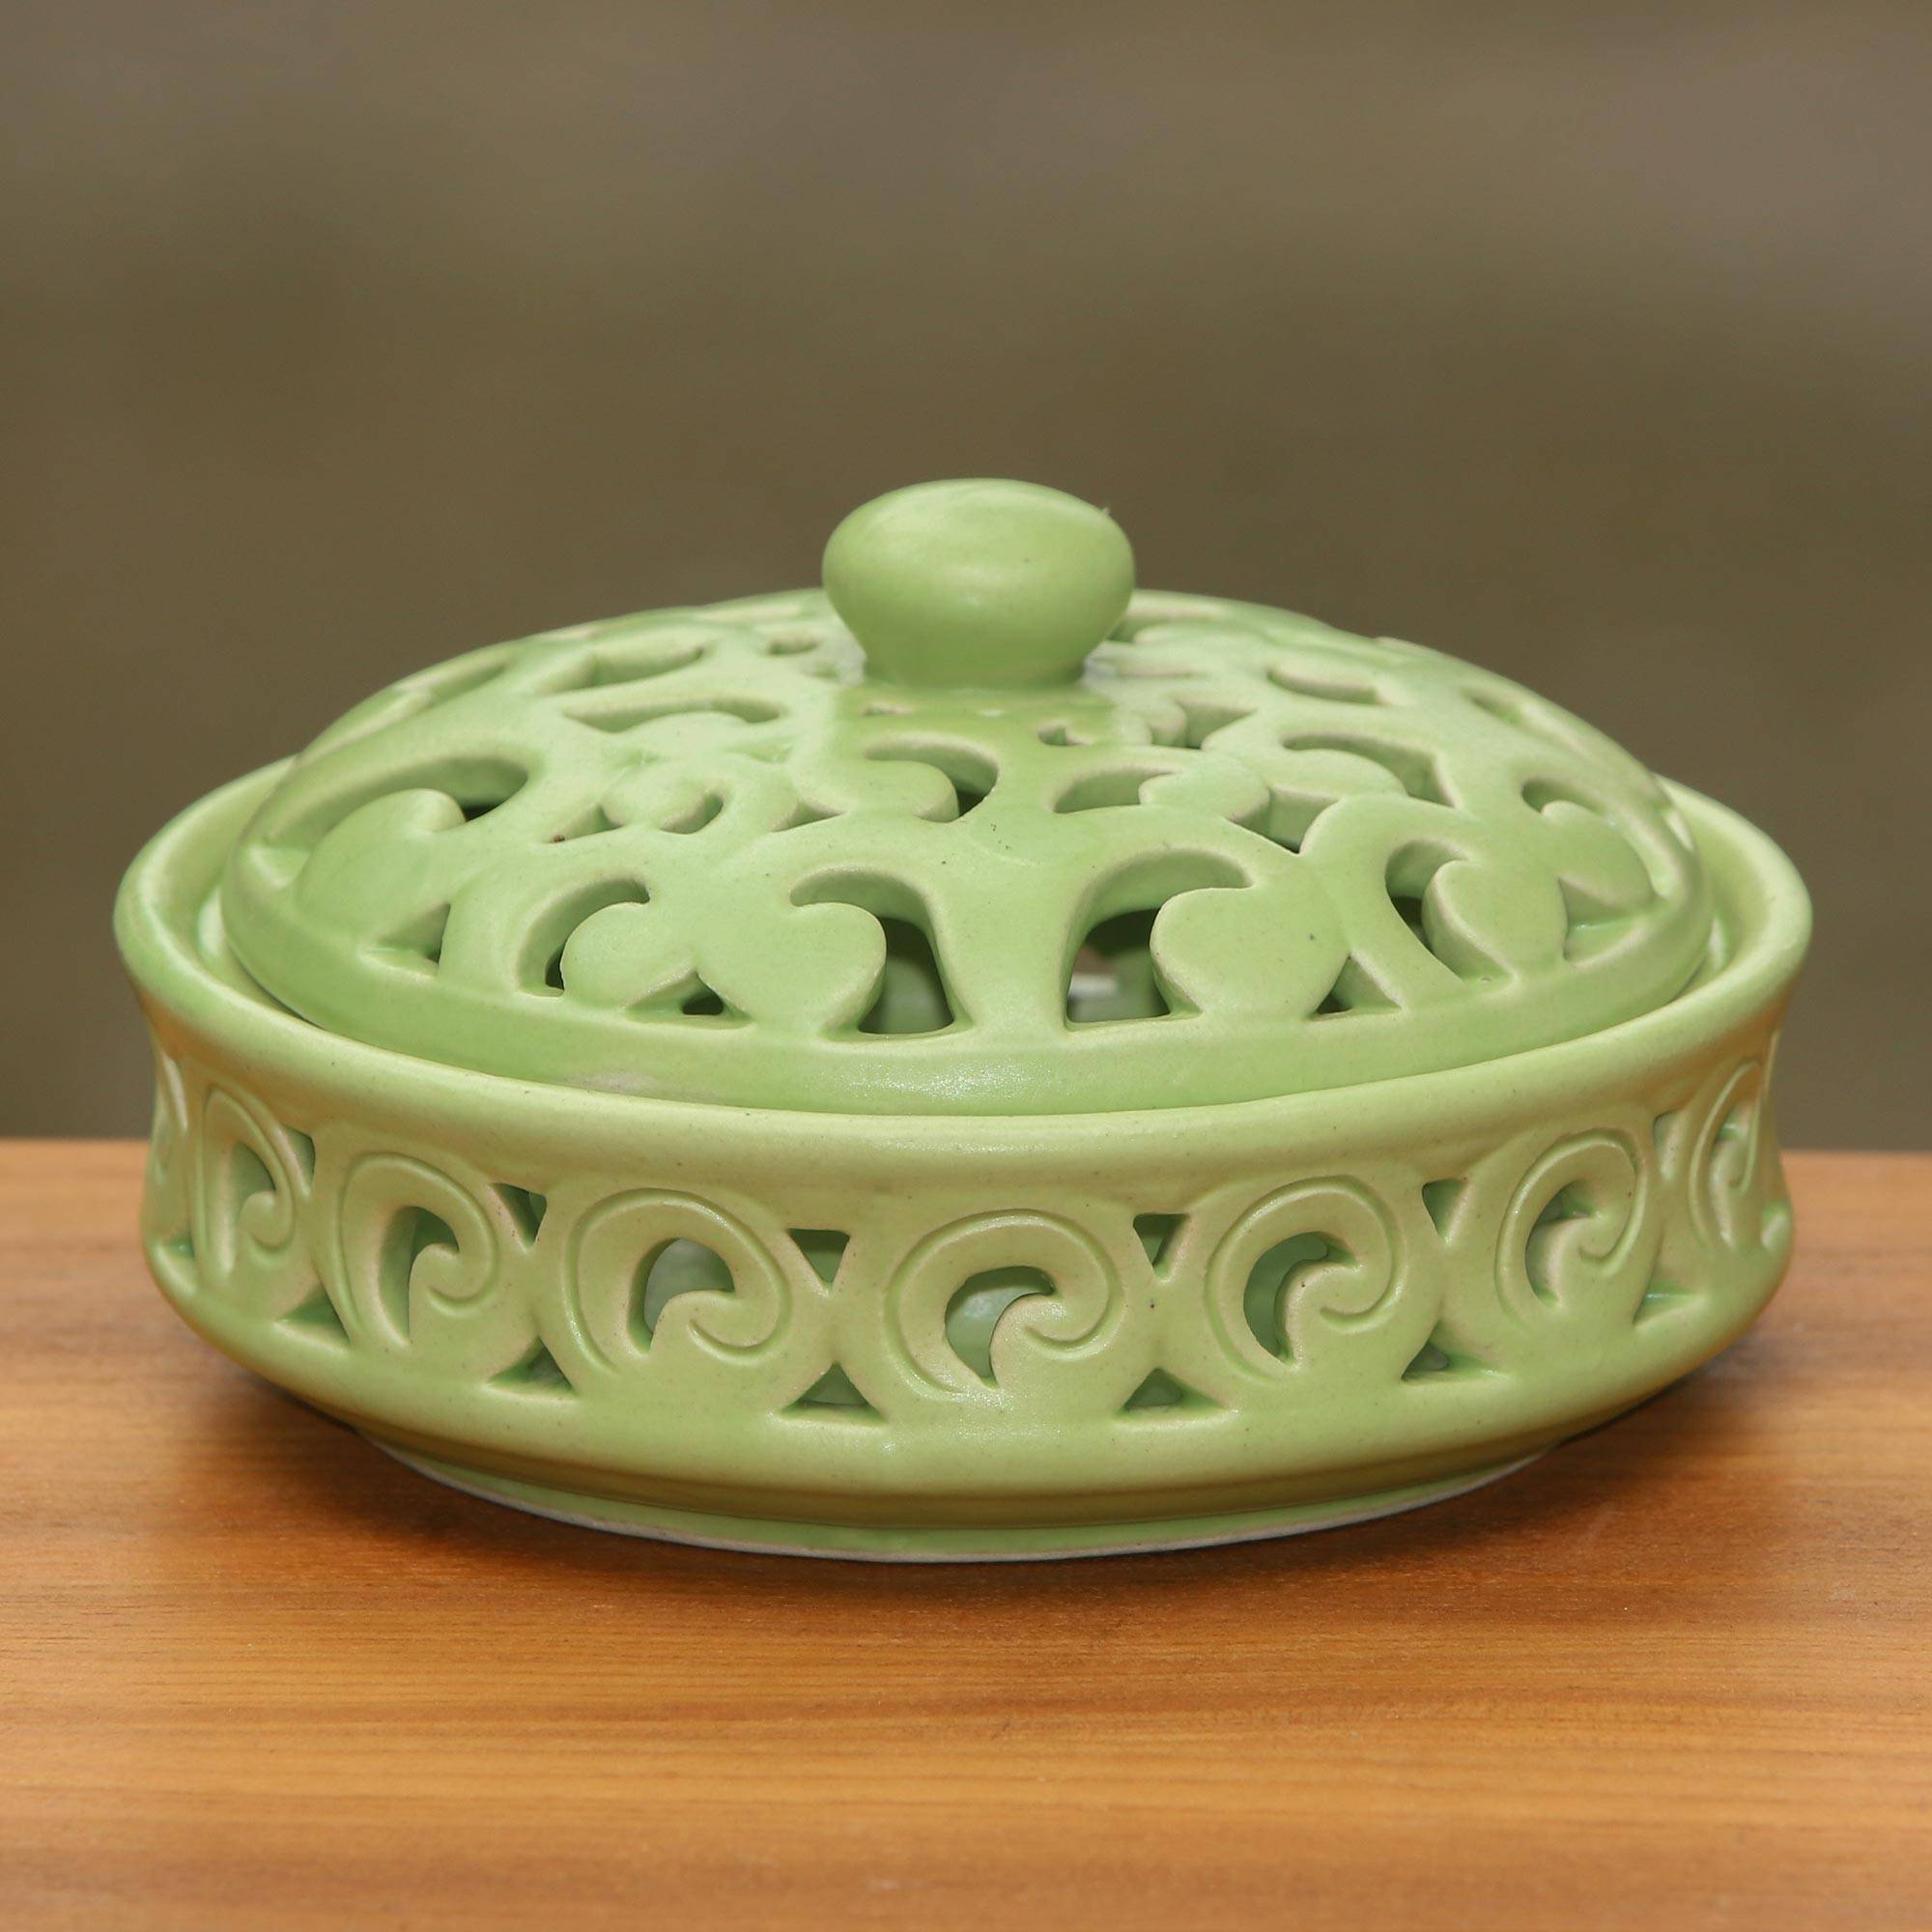 Handmade Ceramic light green choker